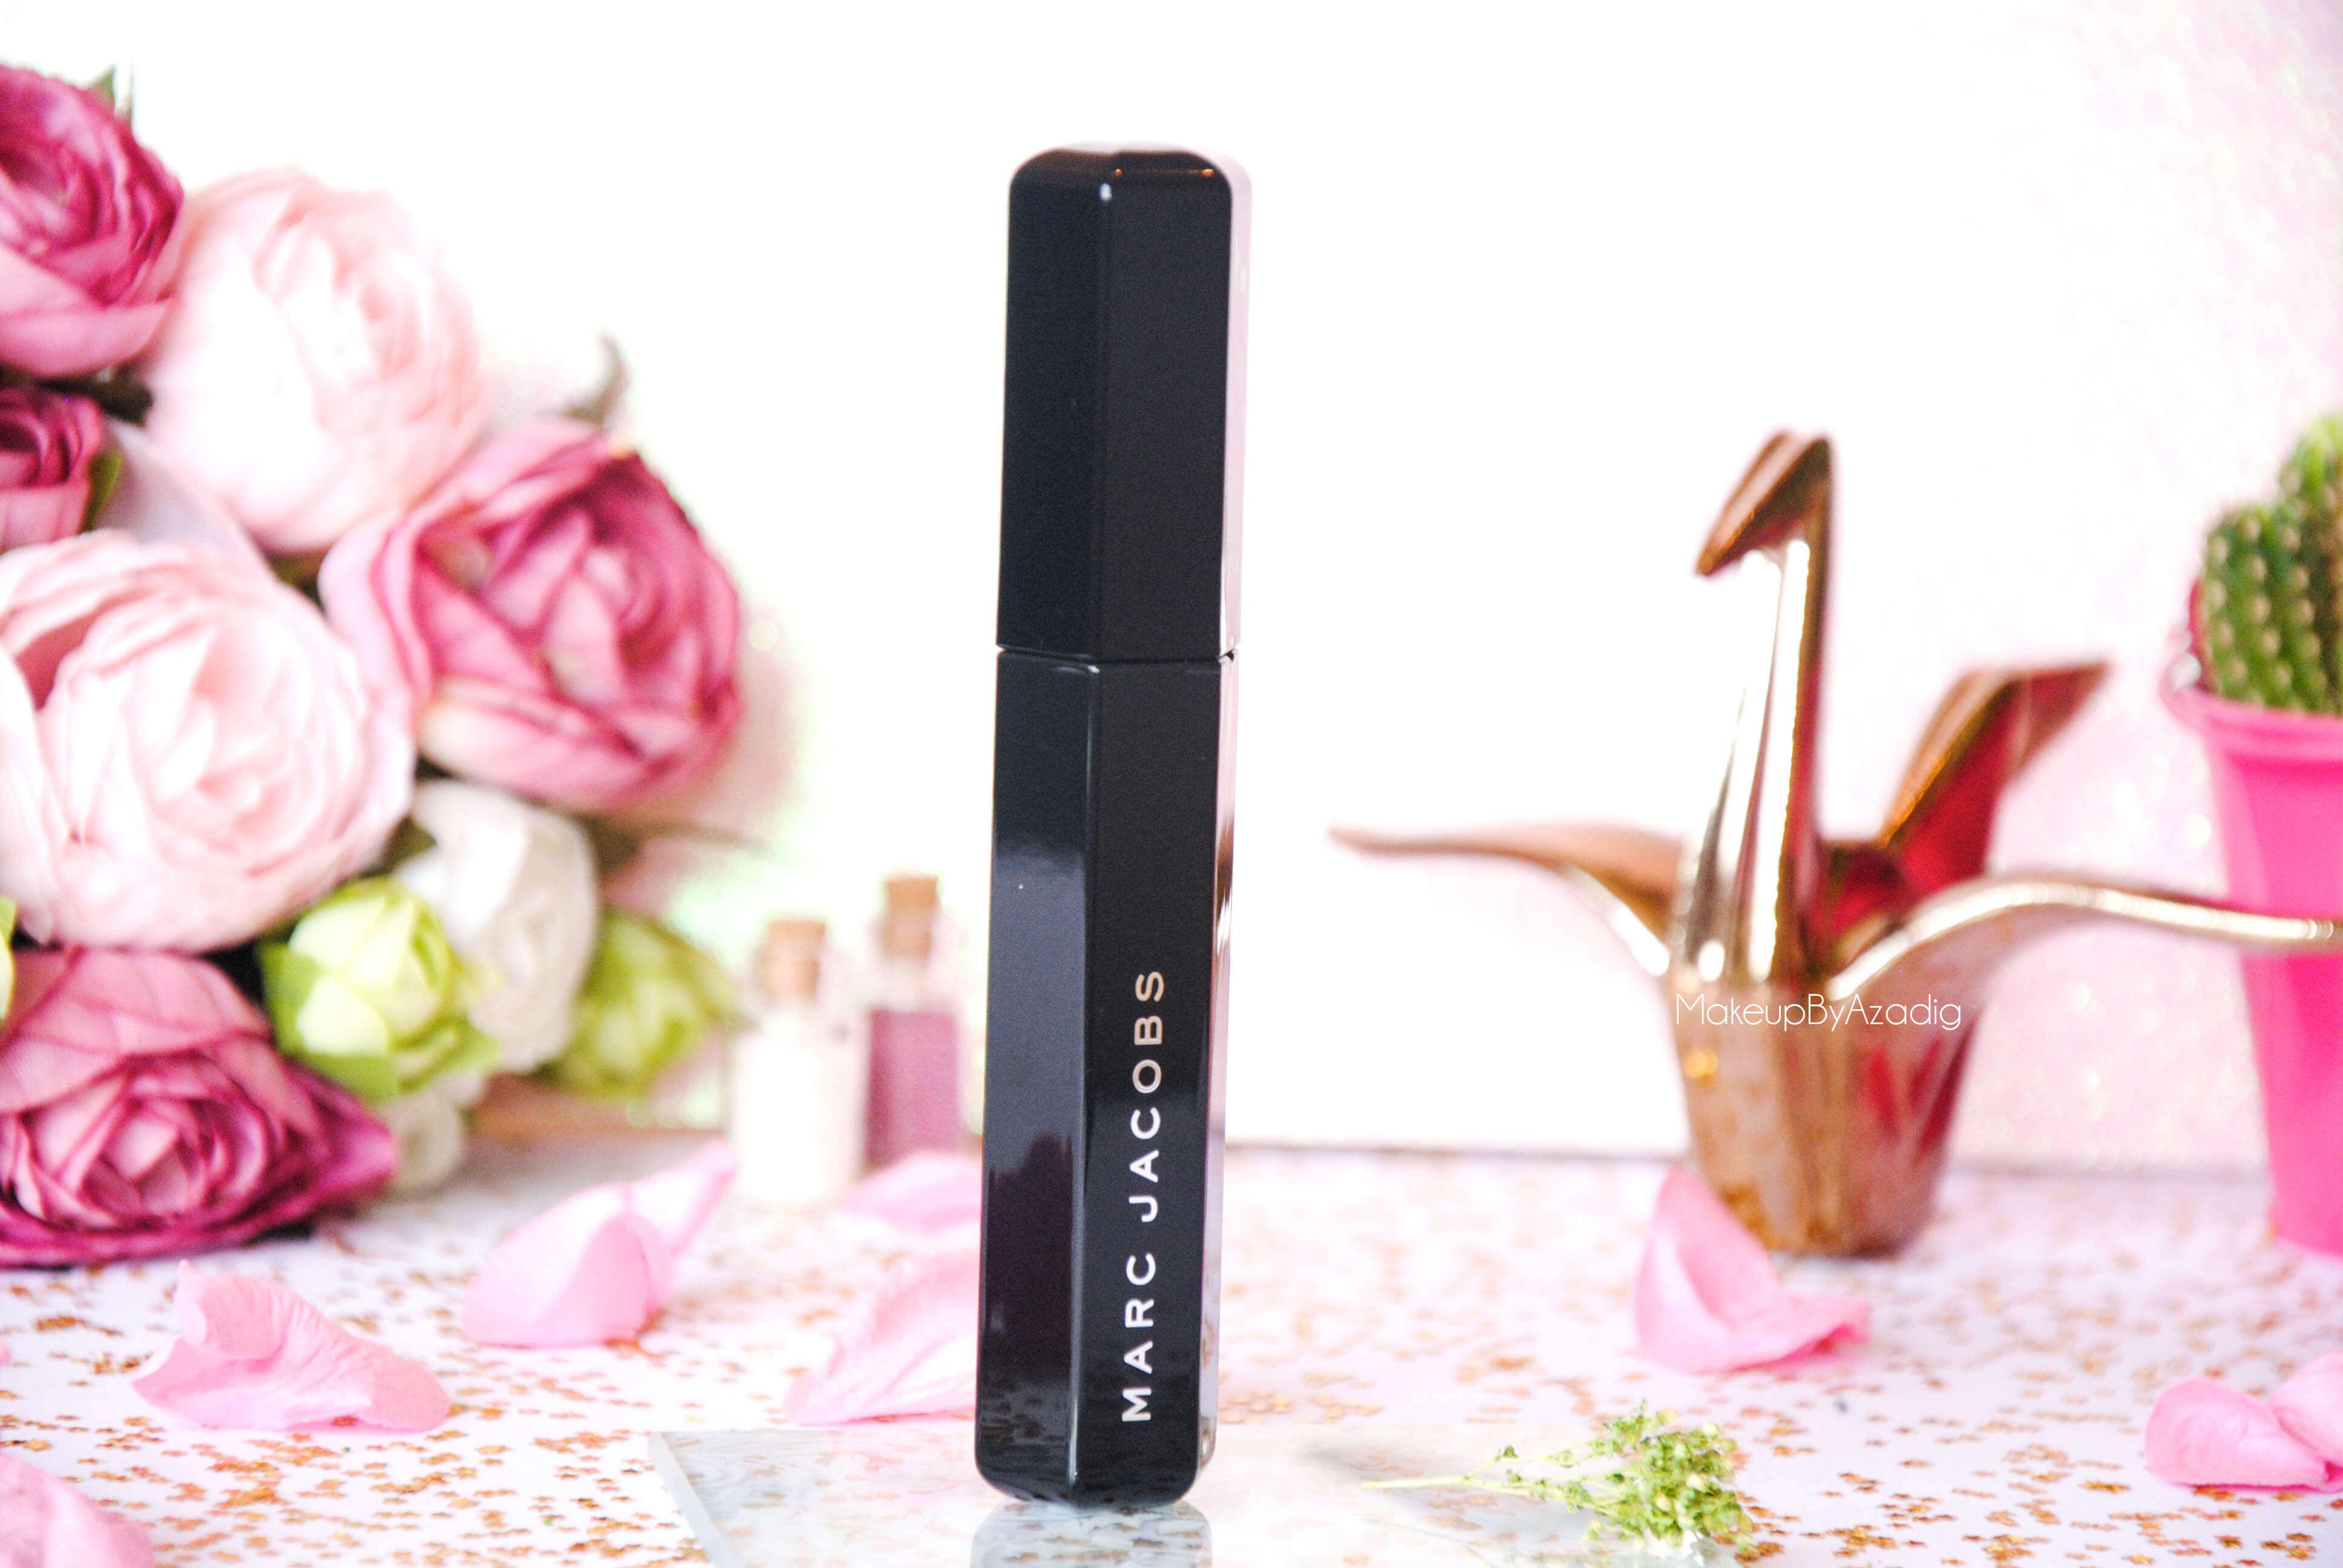 velvet noir-volume spectaculaire-marc jacobs-makeupbyazadig-revue-review-mascara-noir intense-tube